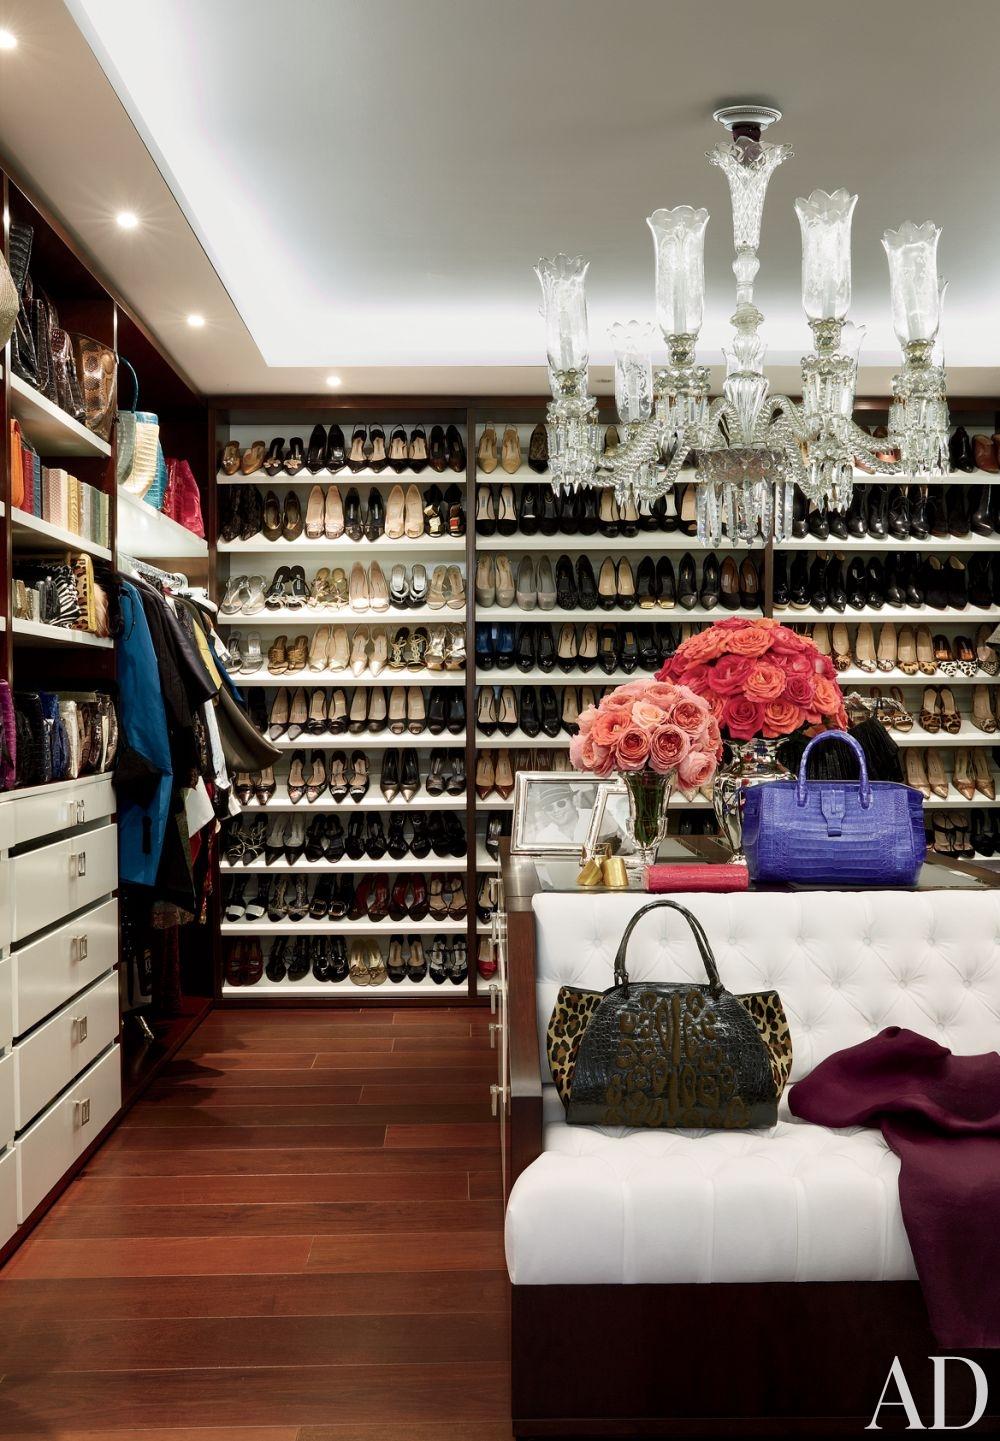 closet_AD_.jpg